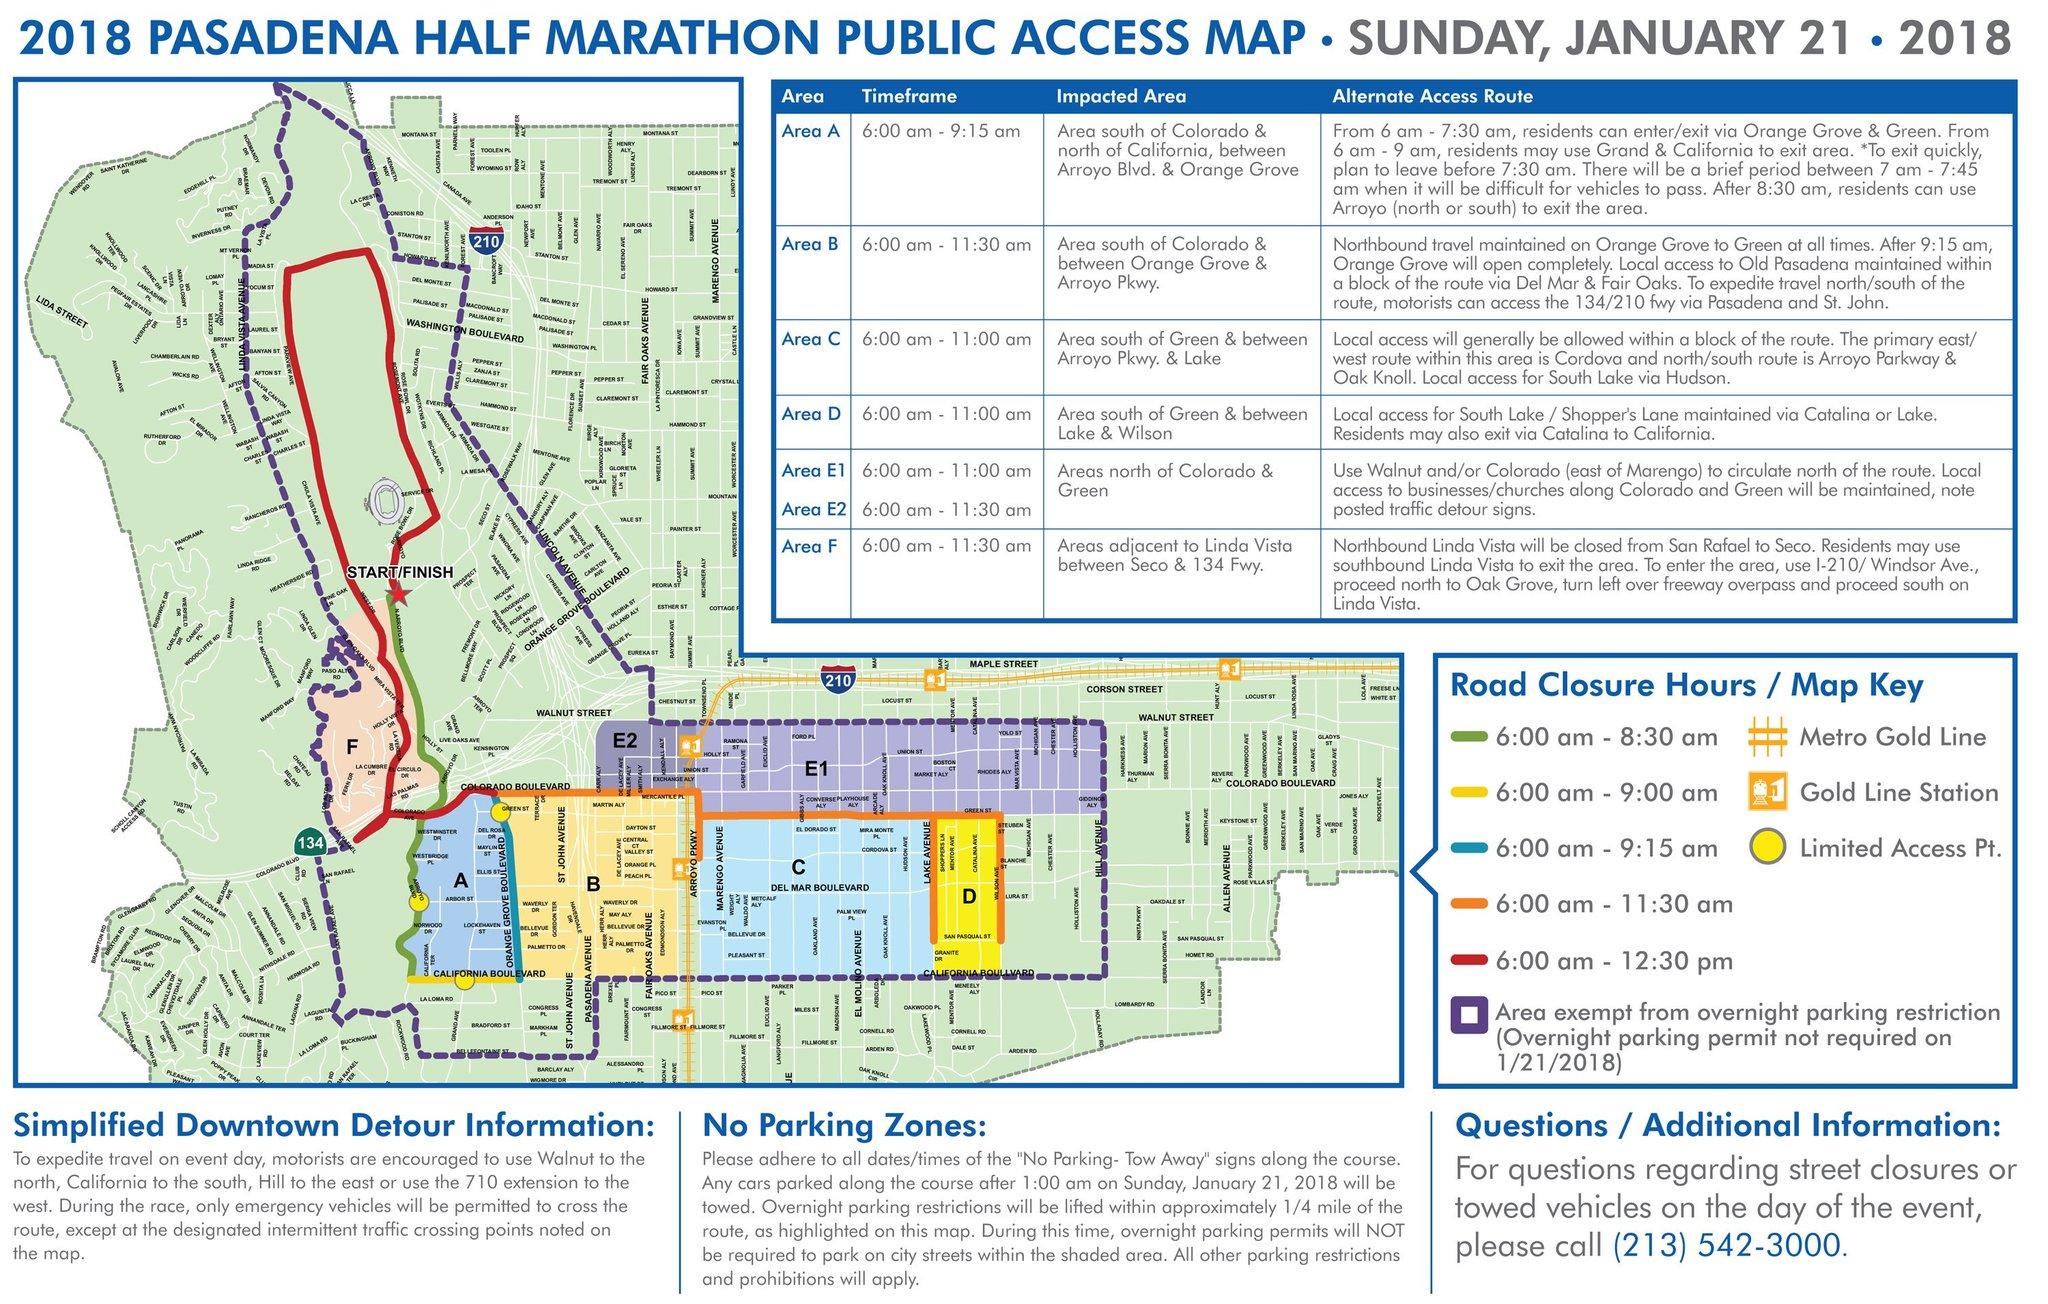 City of Pasadena on Twitter Pasadena Half Marathon and 5K is Jan